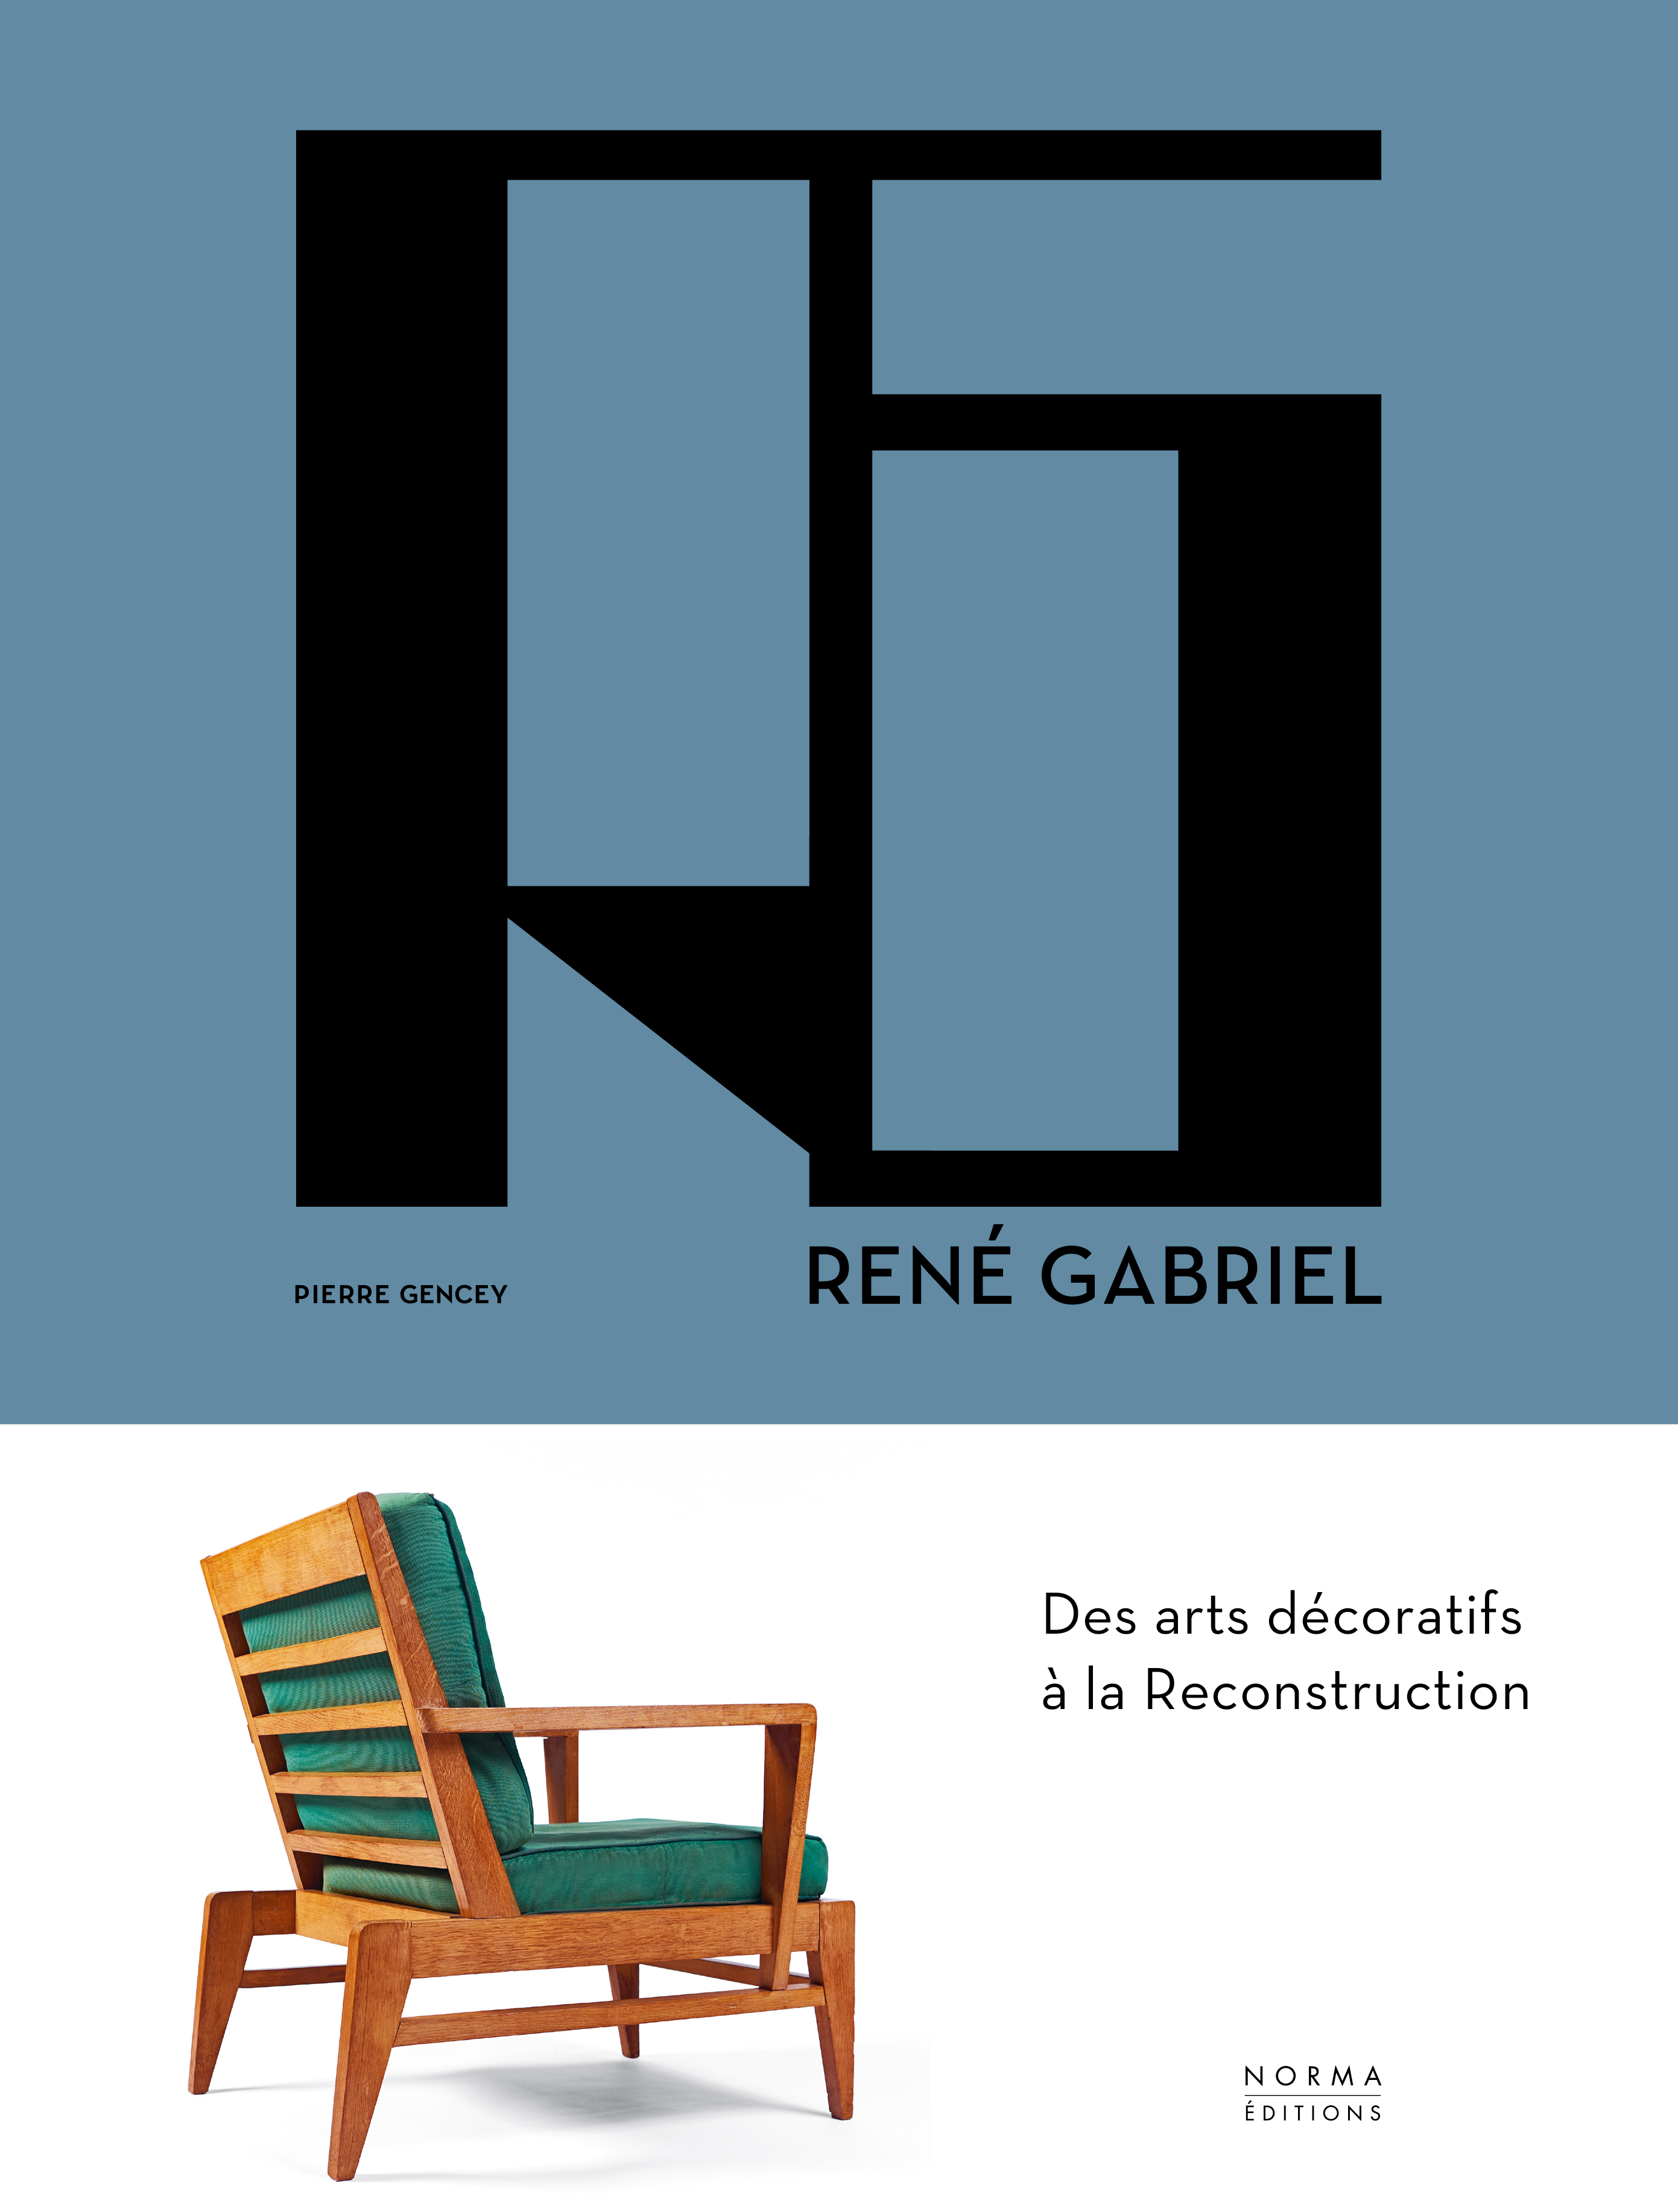 RENE GABRIEL